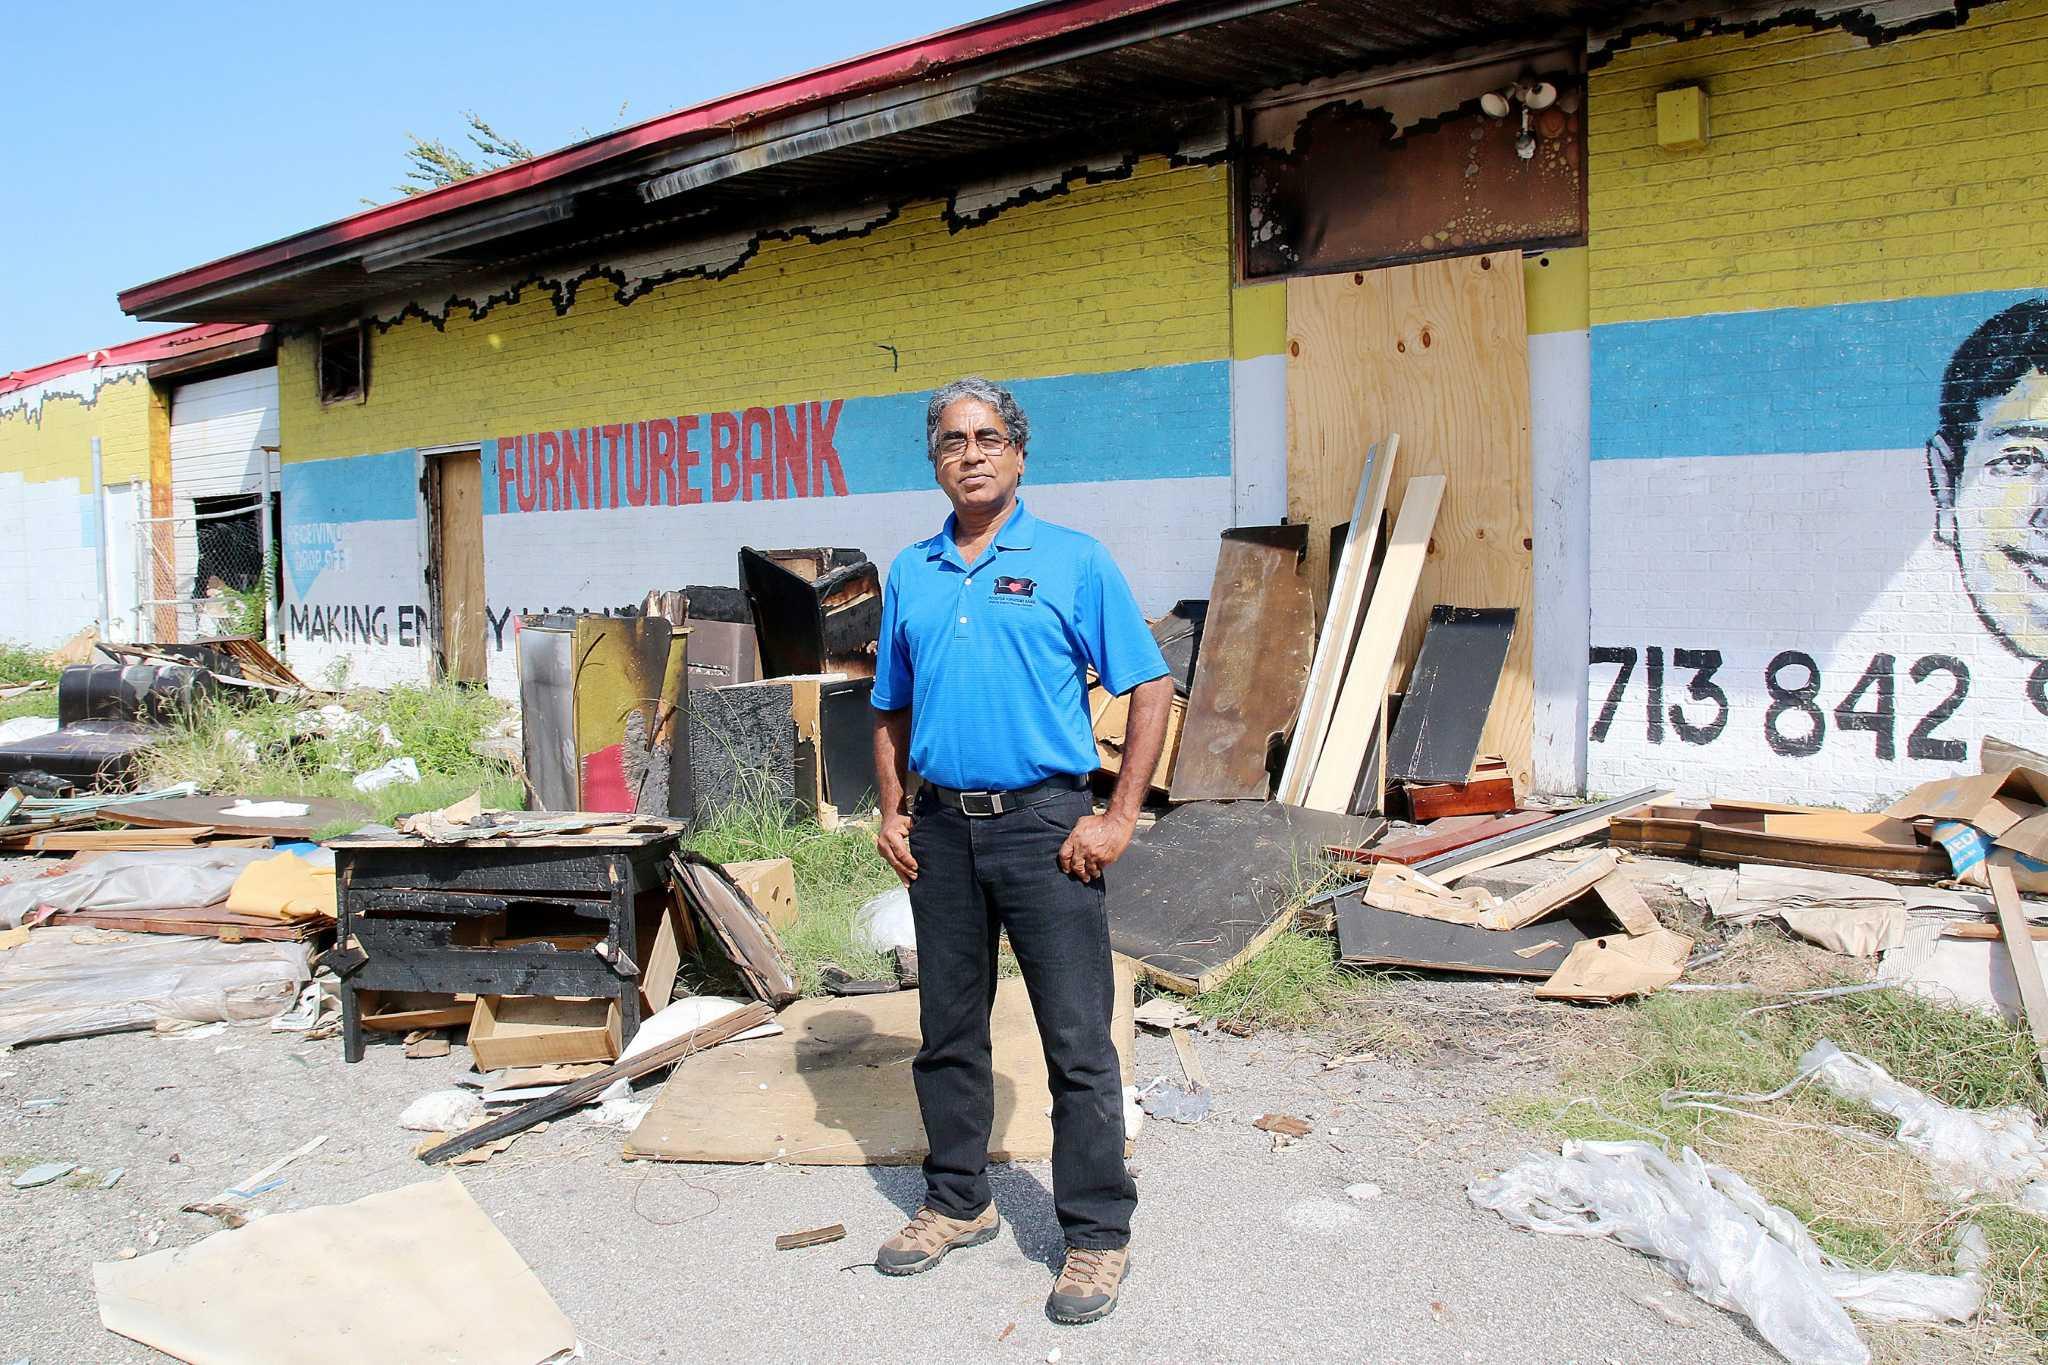 Furniture Nonprofit Gets Needed Donation Houston Chronicle